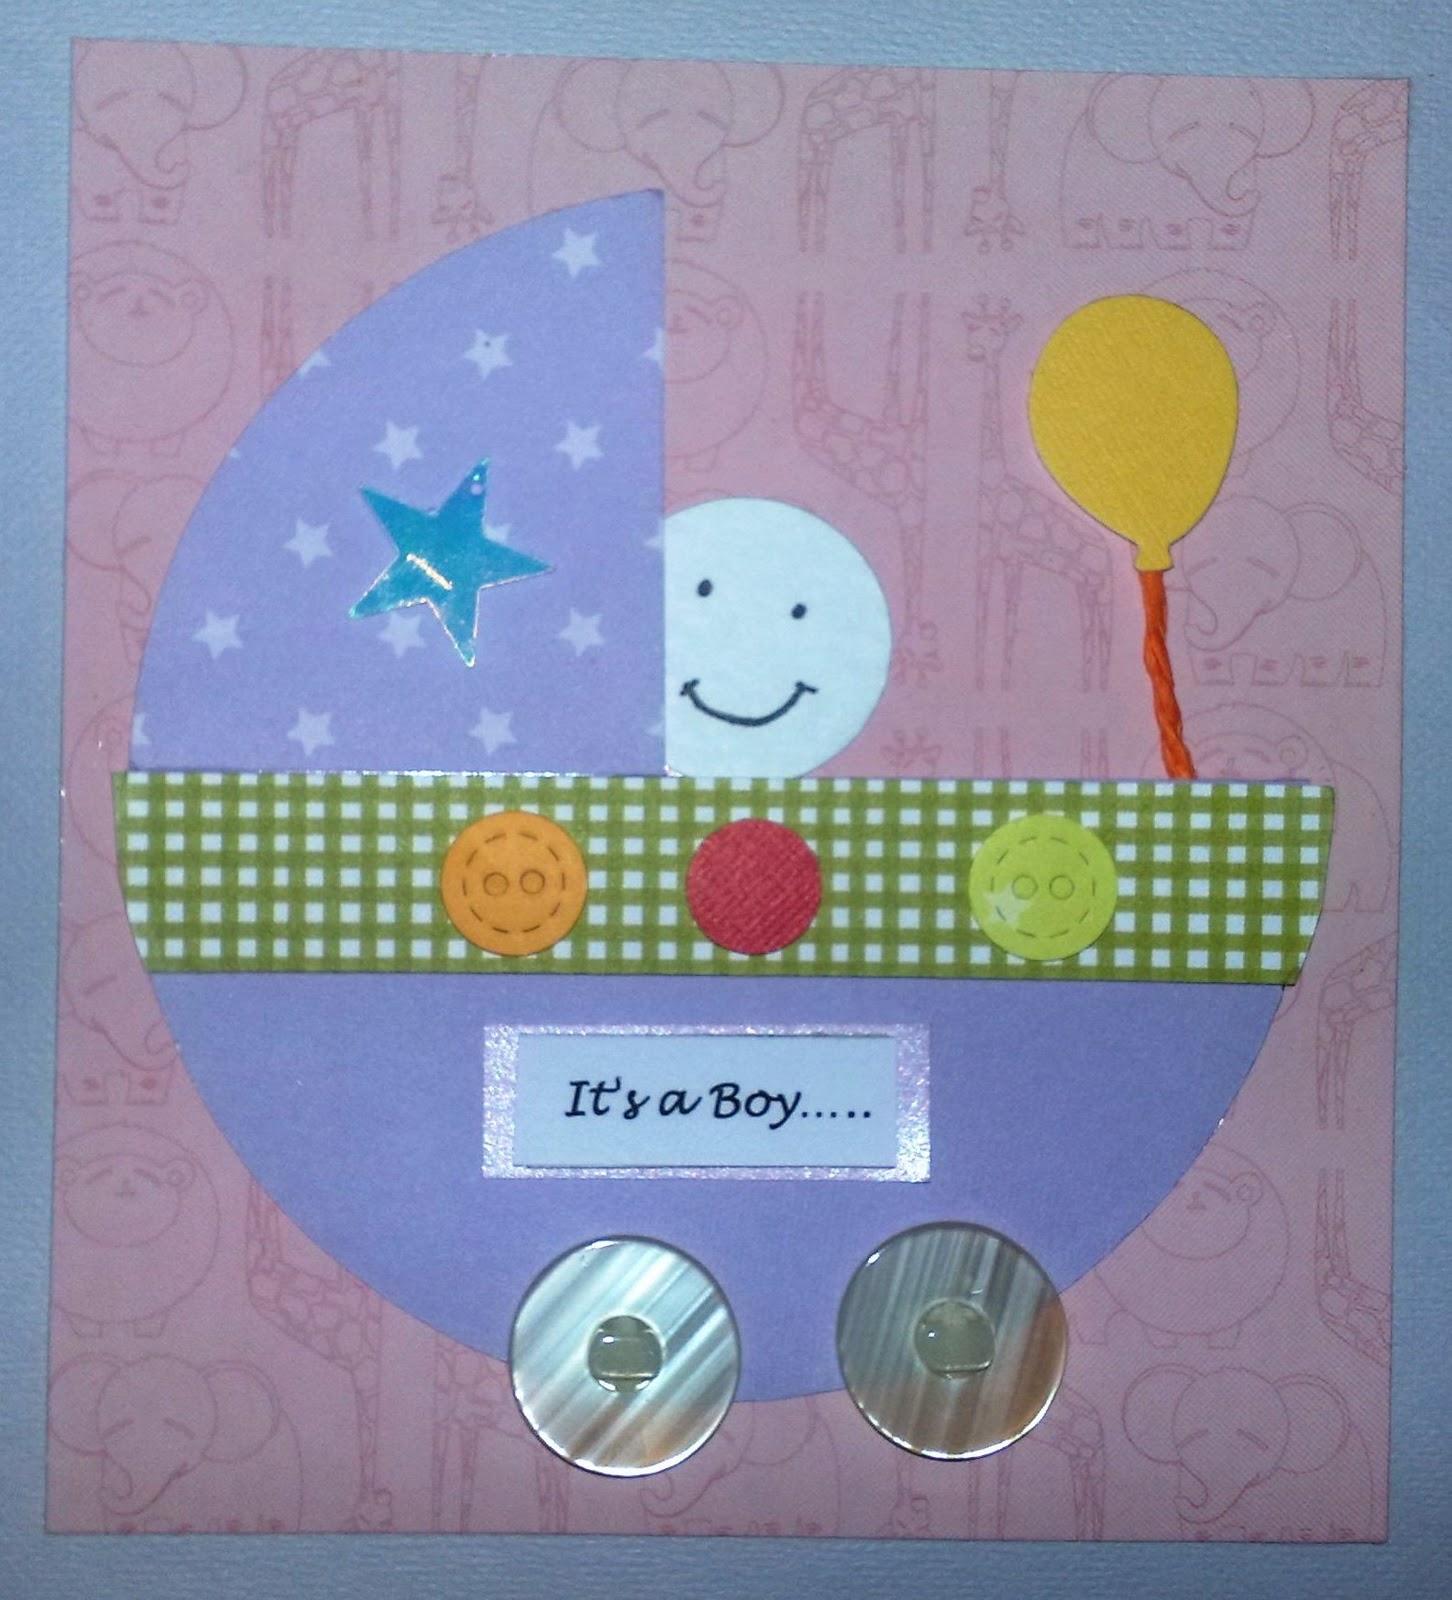 Handmade With Love By Ain New Born Baby Boy Card